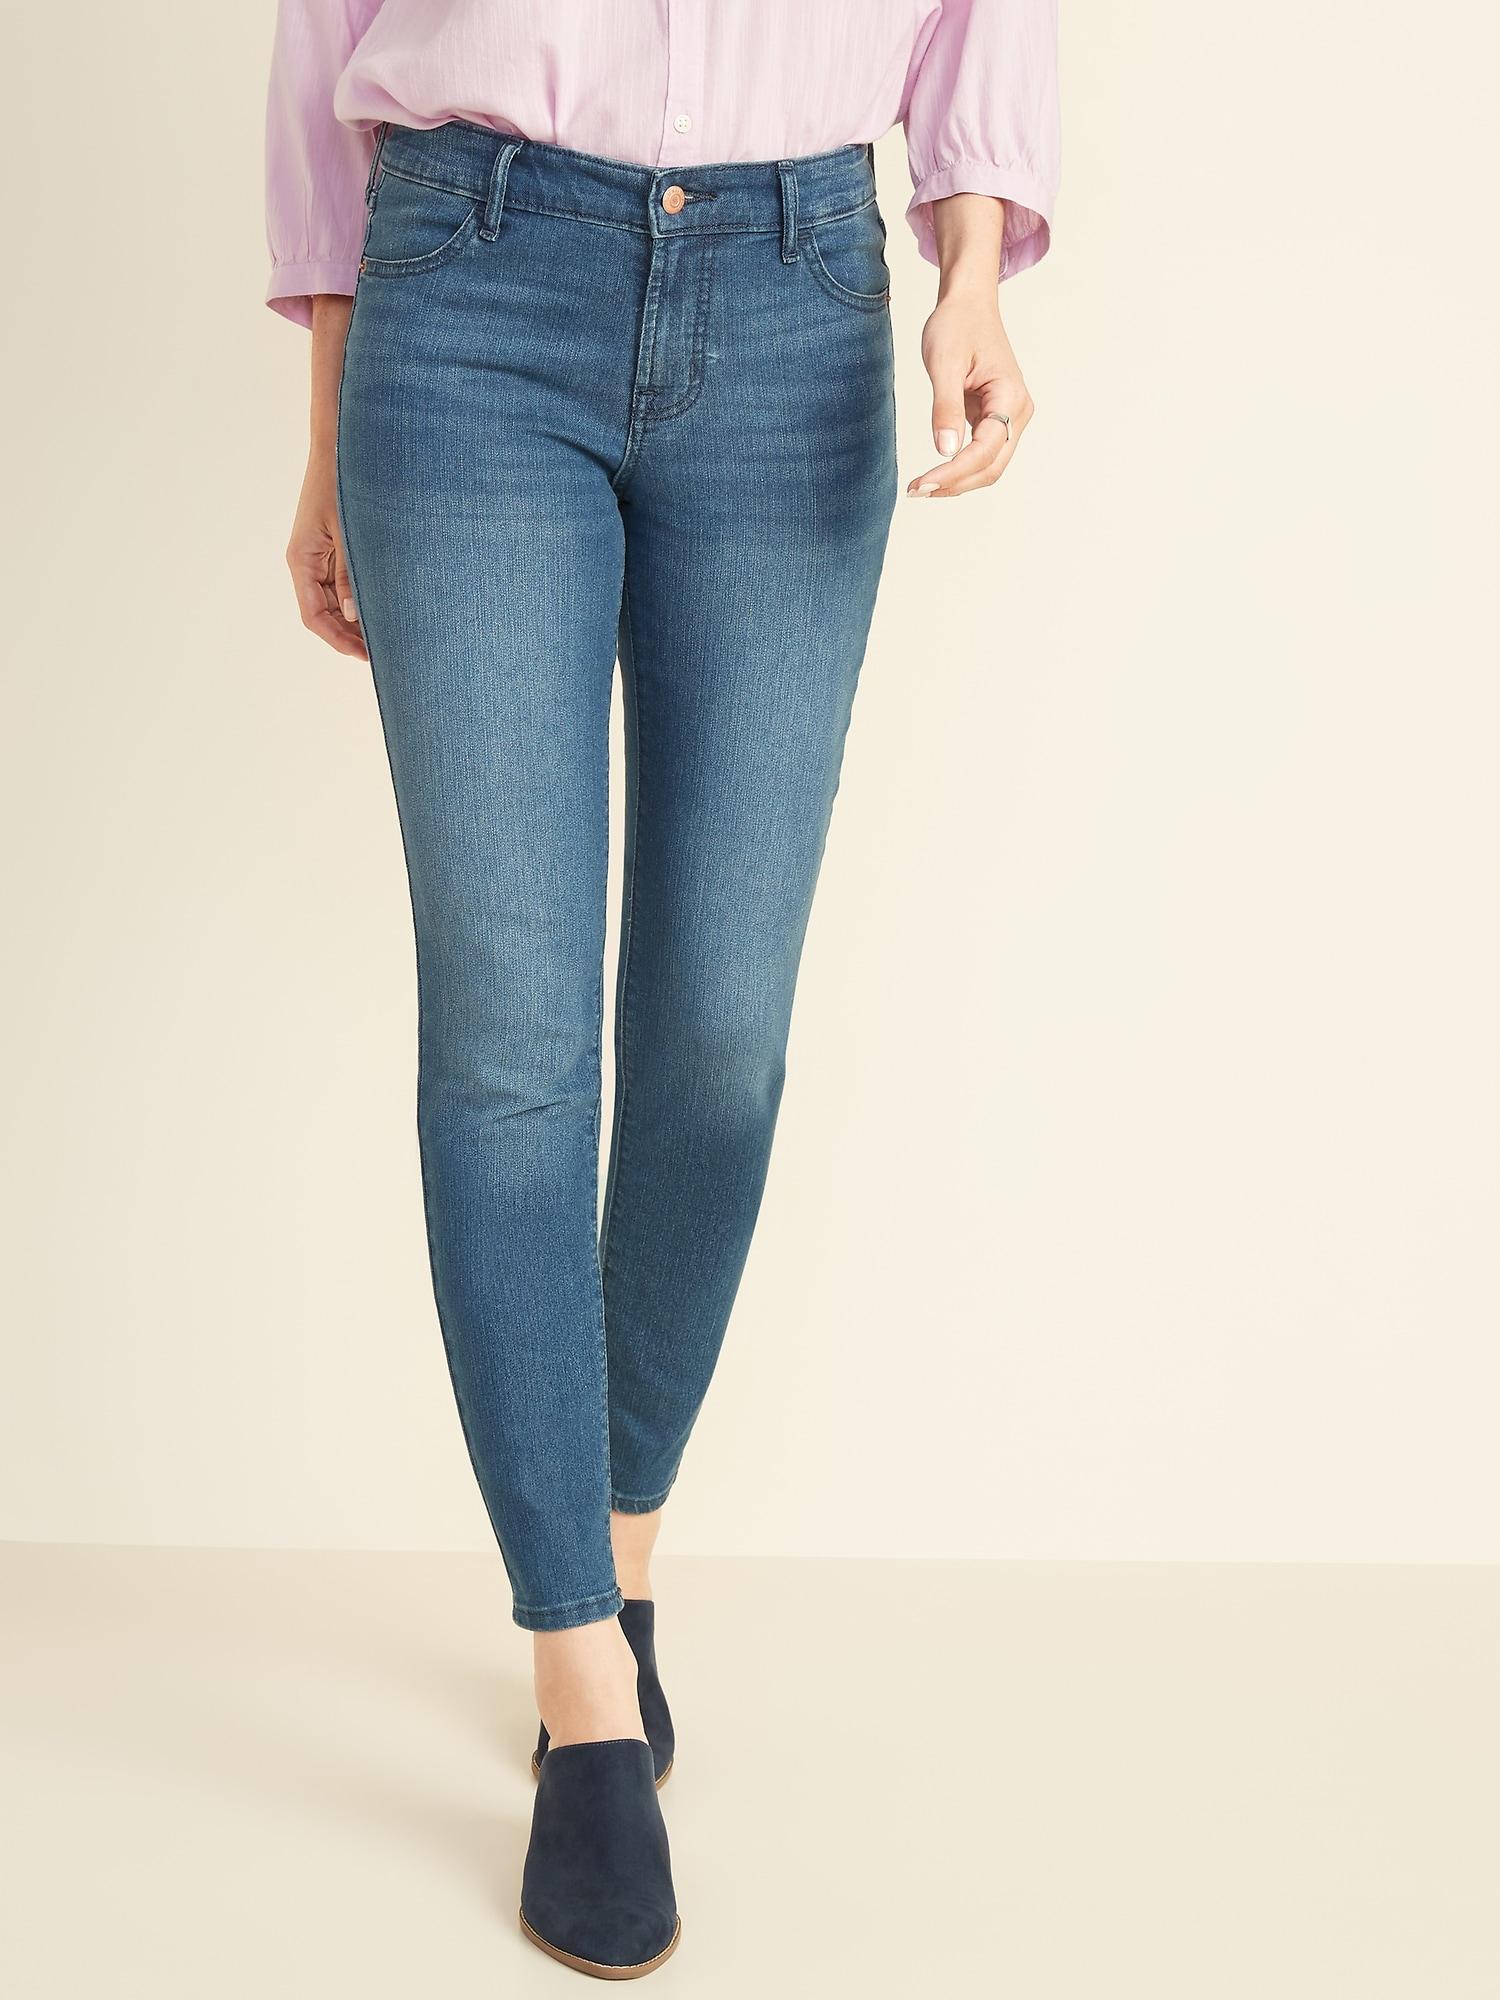 b2b9b02f158ba Mid-Rise Super Skinny Jeans for Women | Old Navy